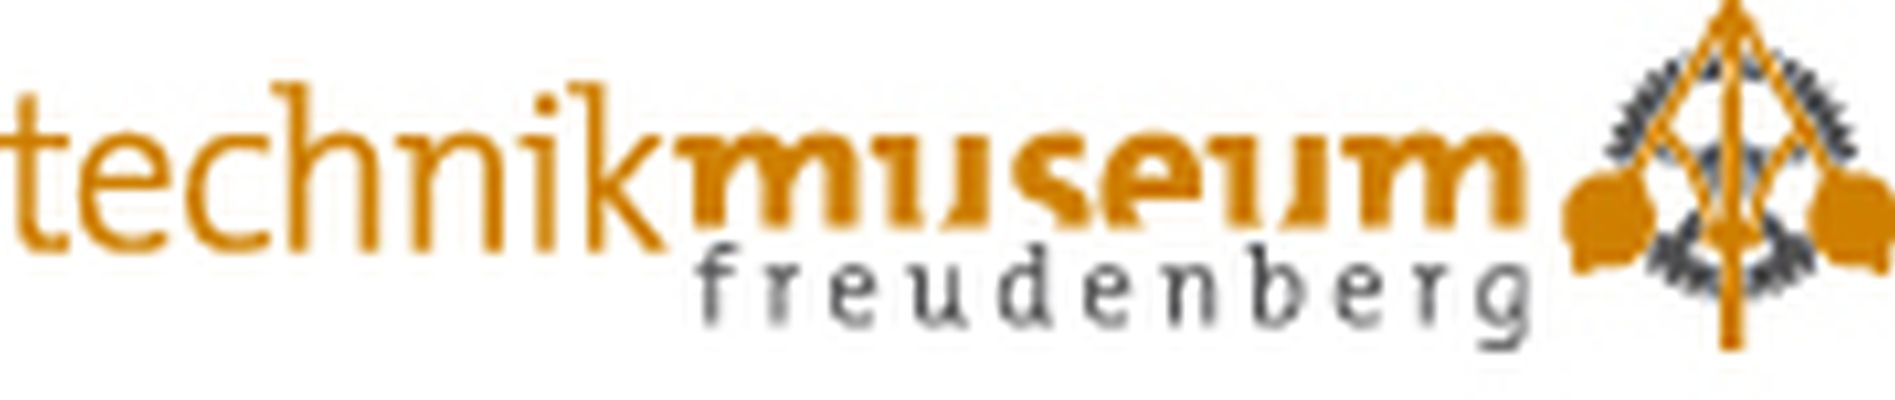 Technikmuseum Freudenberg - Faszination Technik aktiv fördern!